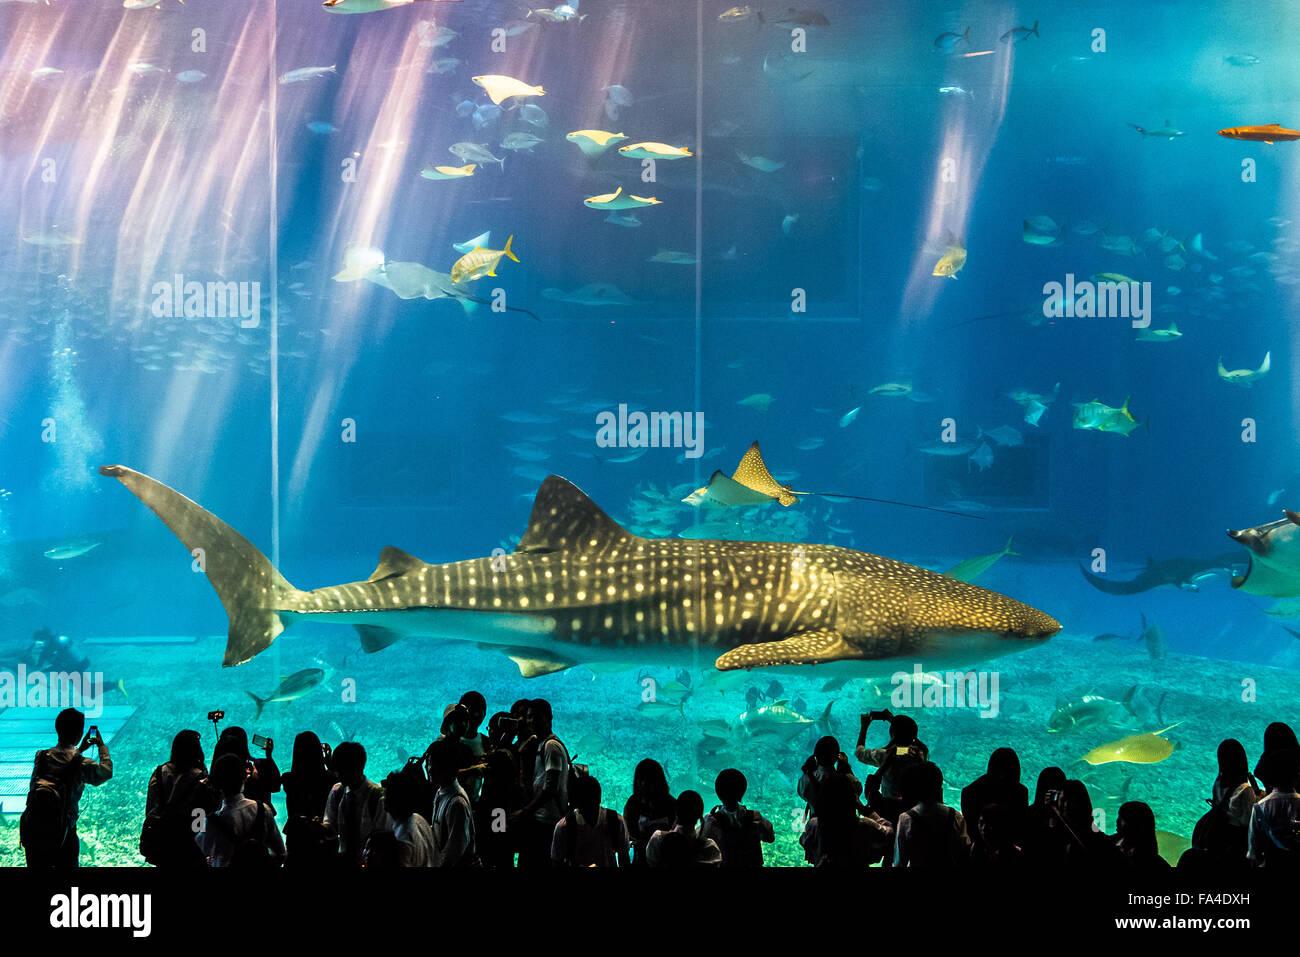 Fish aquarium japan - Whale Shark And Students At The Okinawa Churaumi Aquarium Japan Stock Image